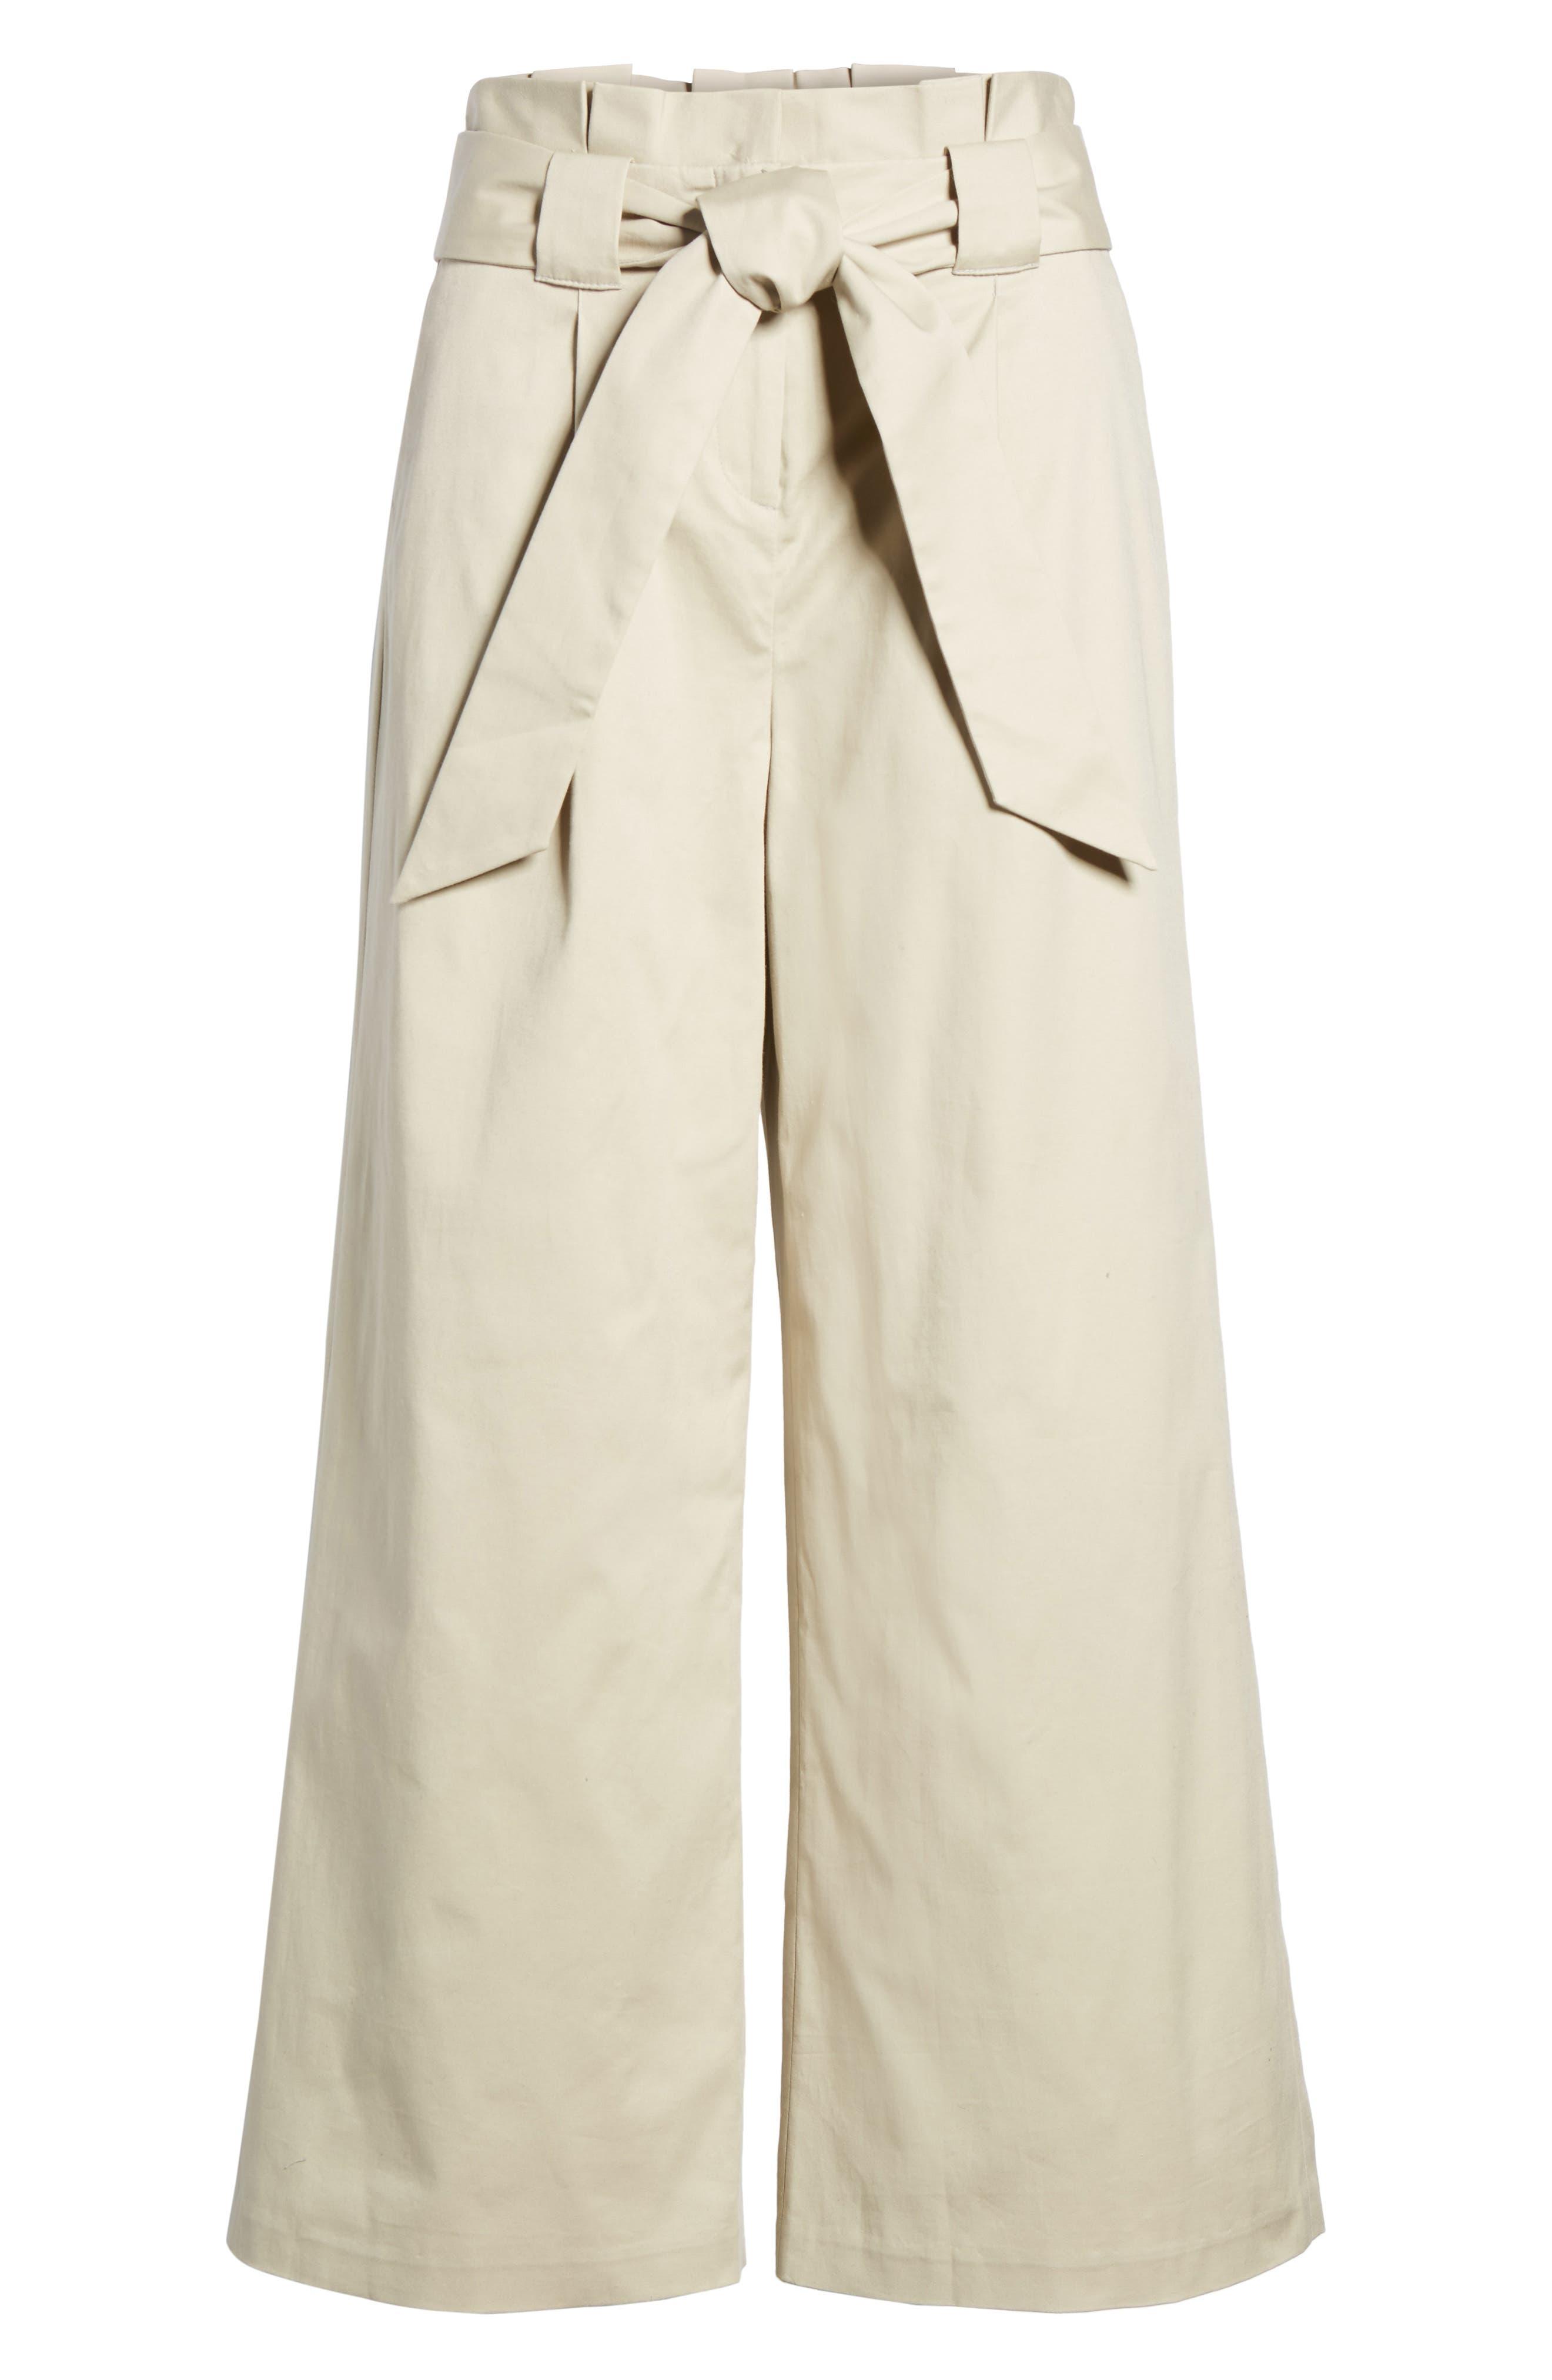 Paperbag Waist Belted Wide Leg Crop Pants,                             Alternate thumbnail 7, color,                             Tan Oxford